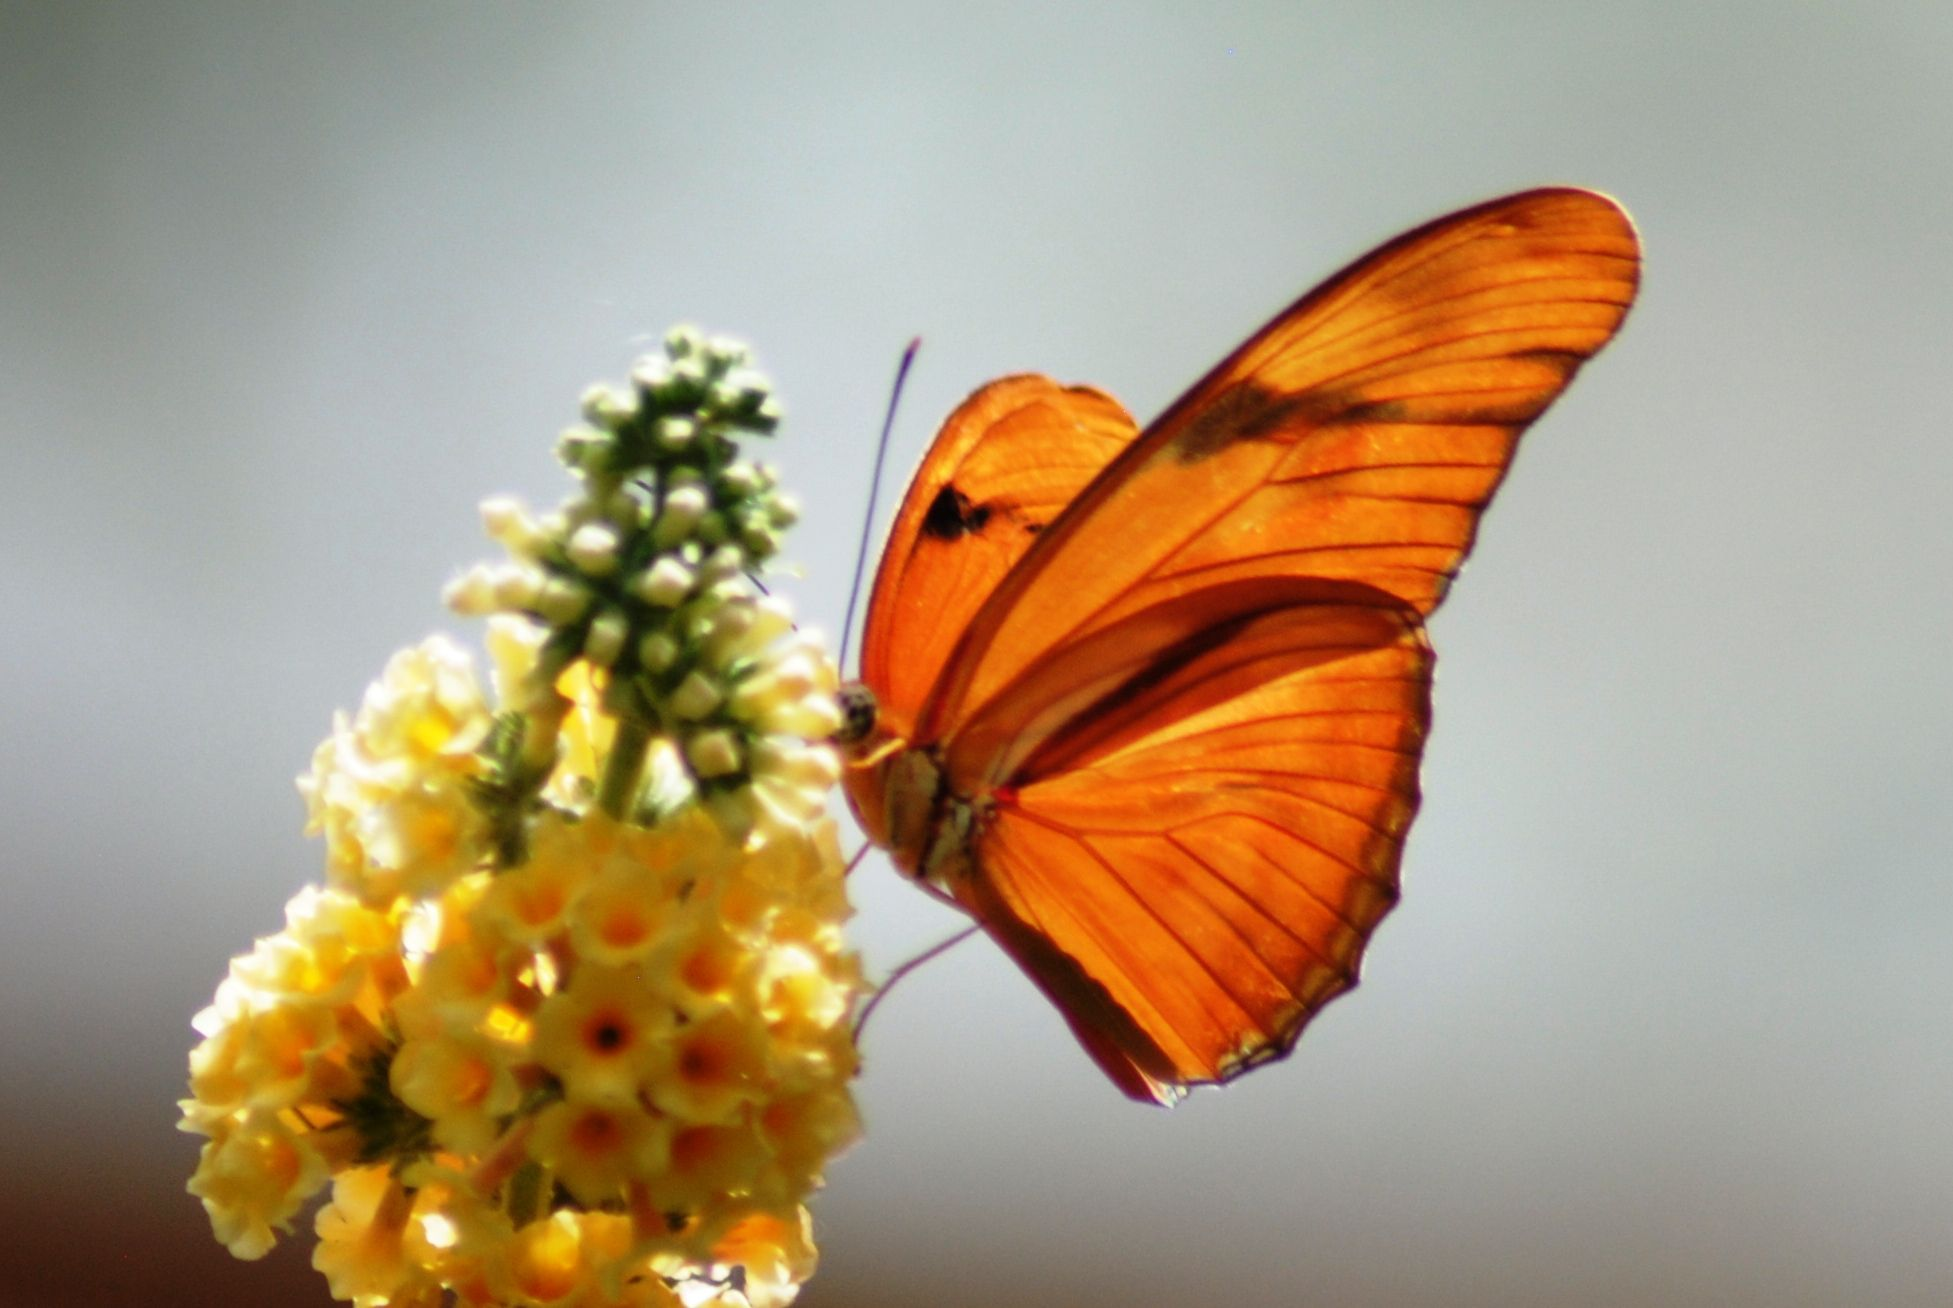 Orange butterfly spotted in Corpus Cristi, TX. Orange